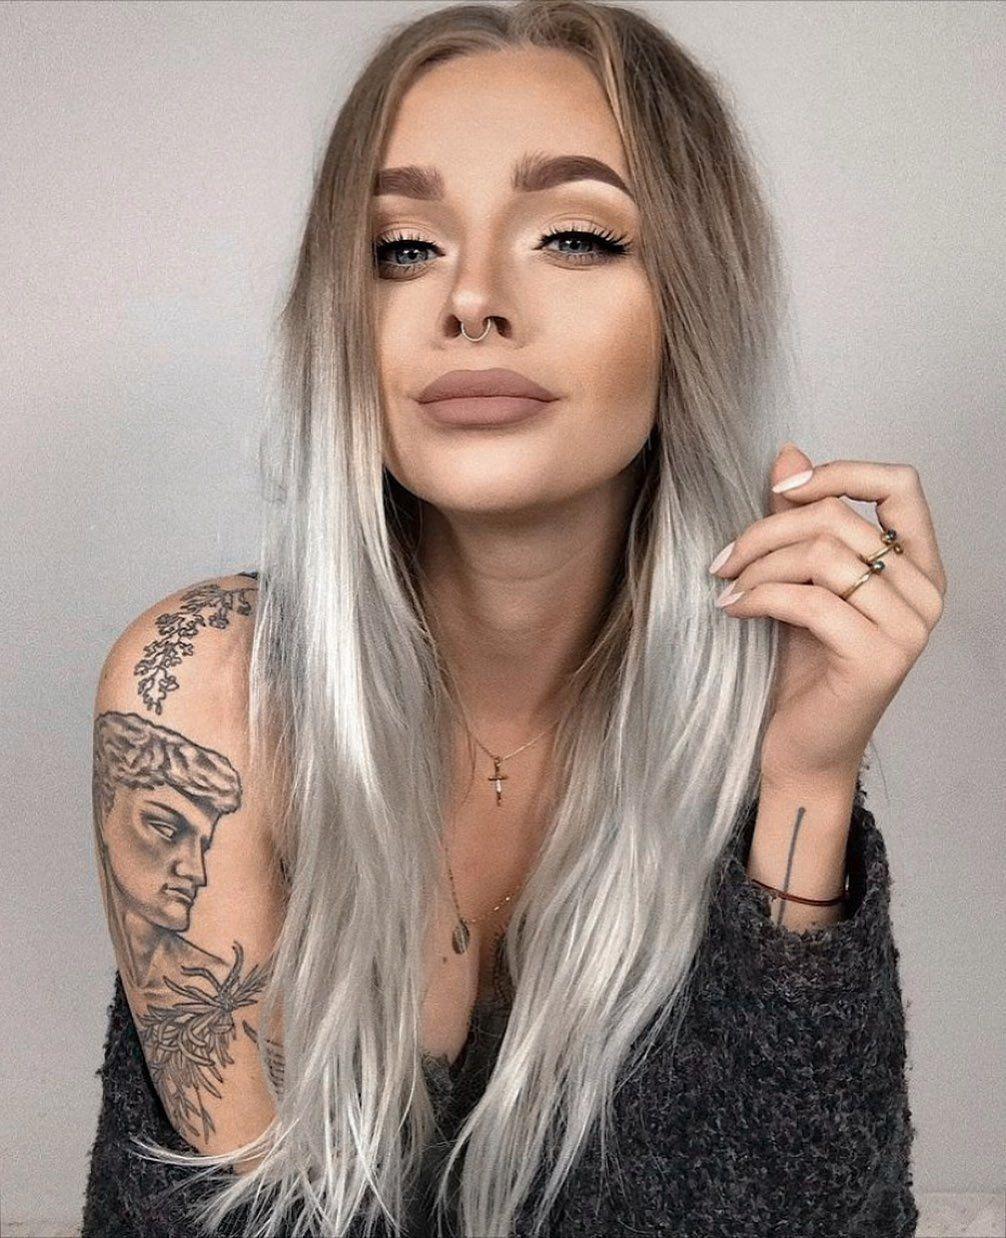 blonde hair tattoo girl